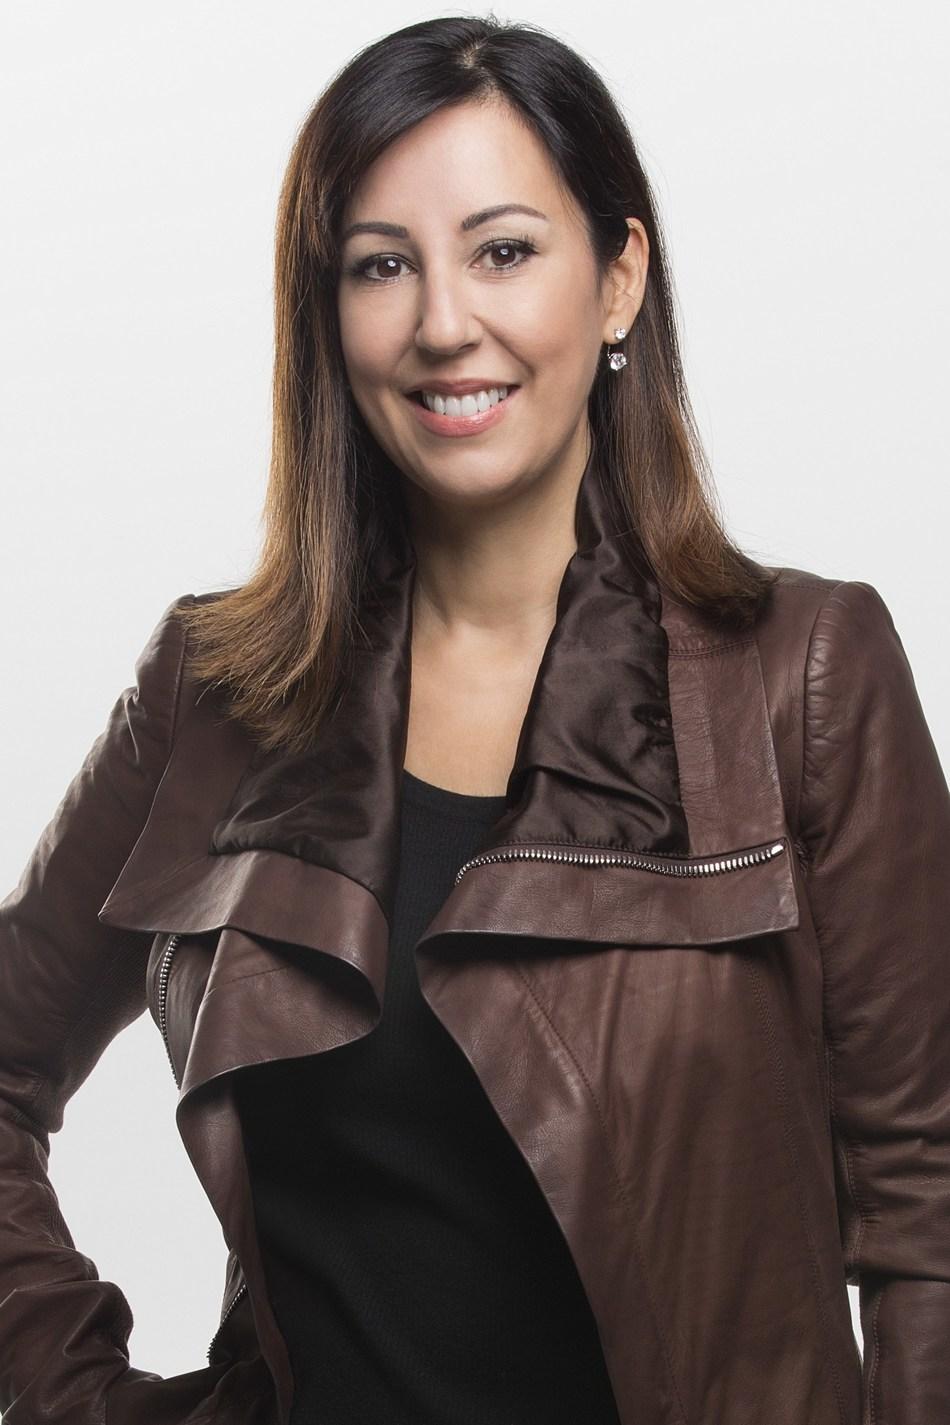 Jill Woodworth, Peloton Chief Financial Officer